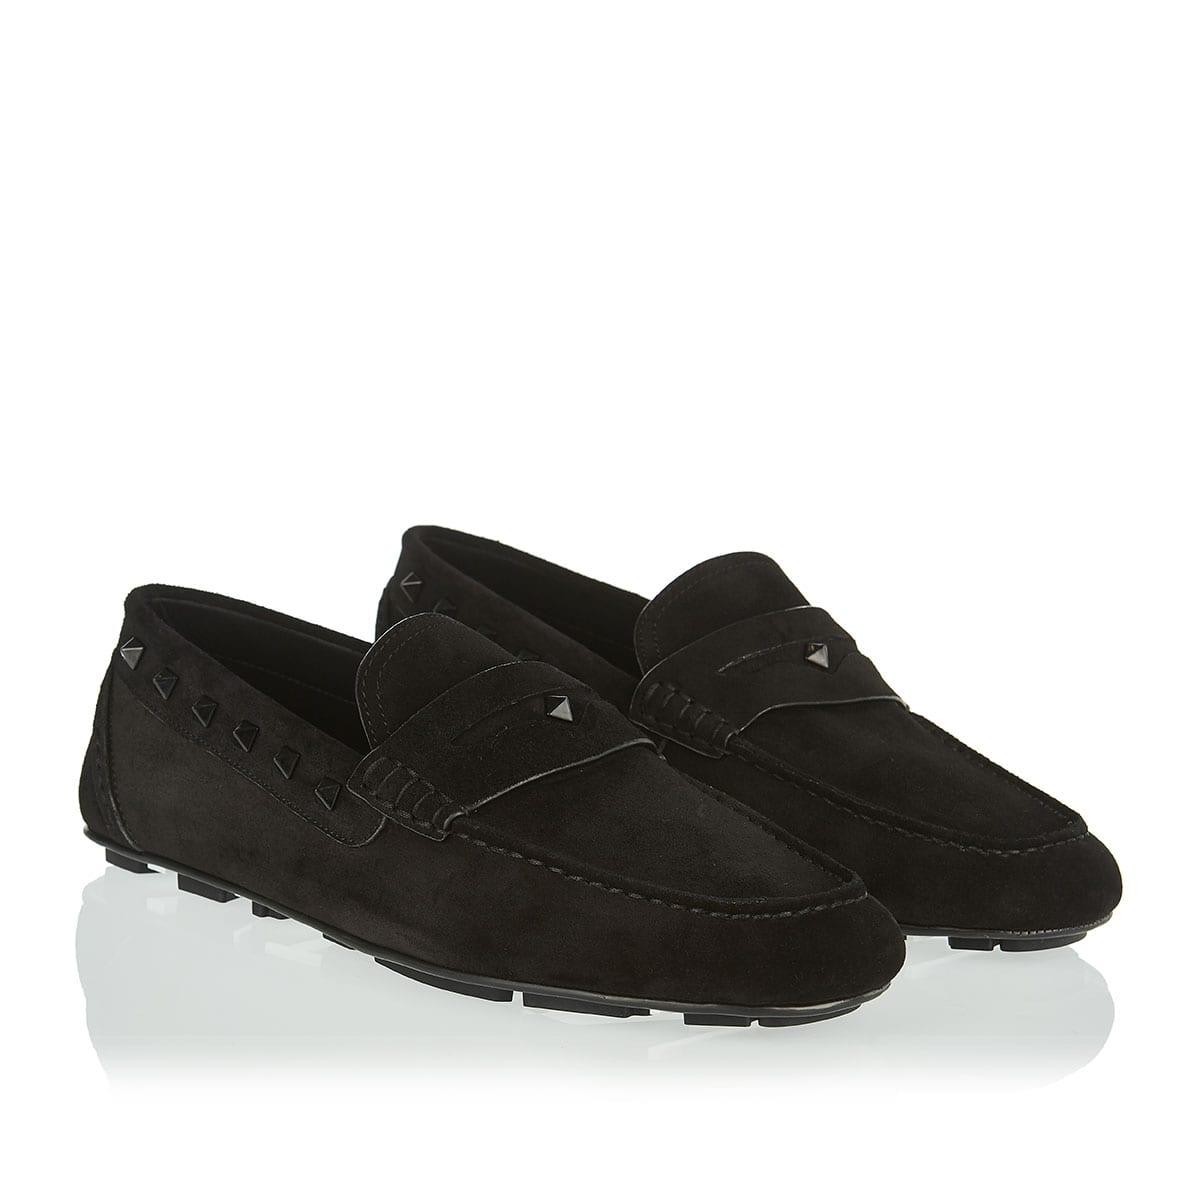 Rockstud suede loafers